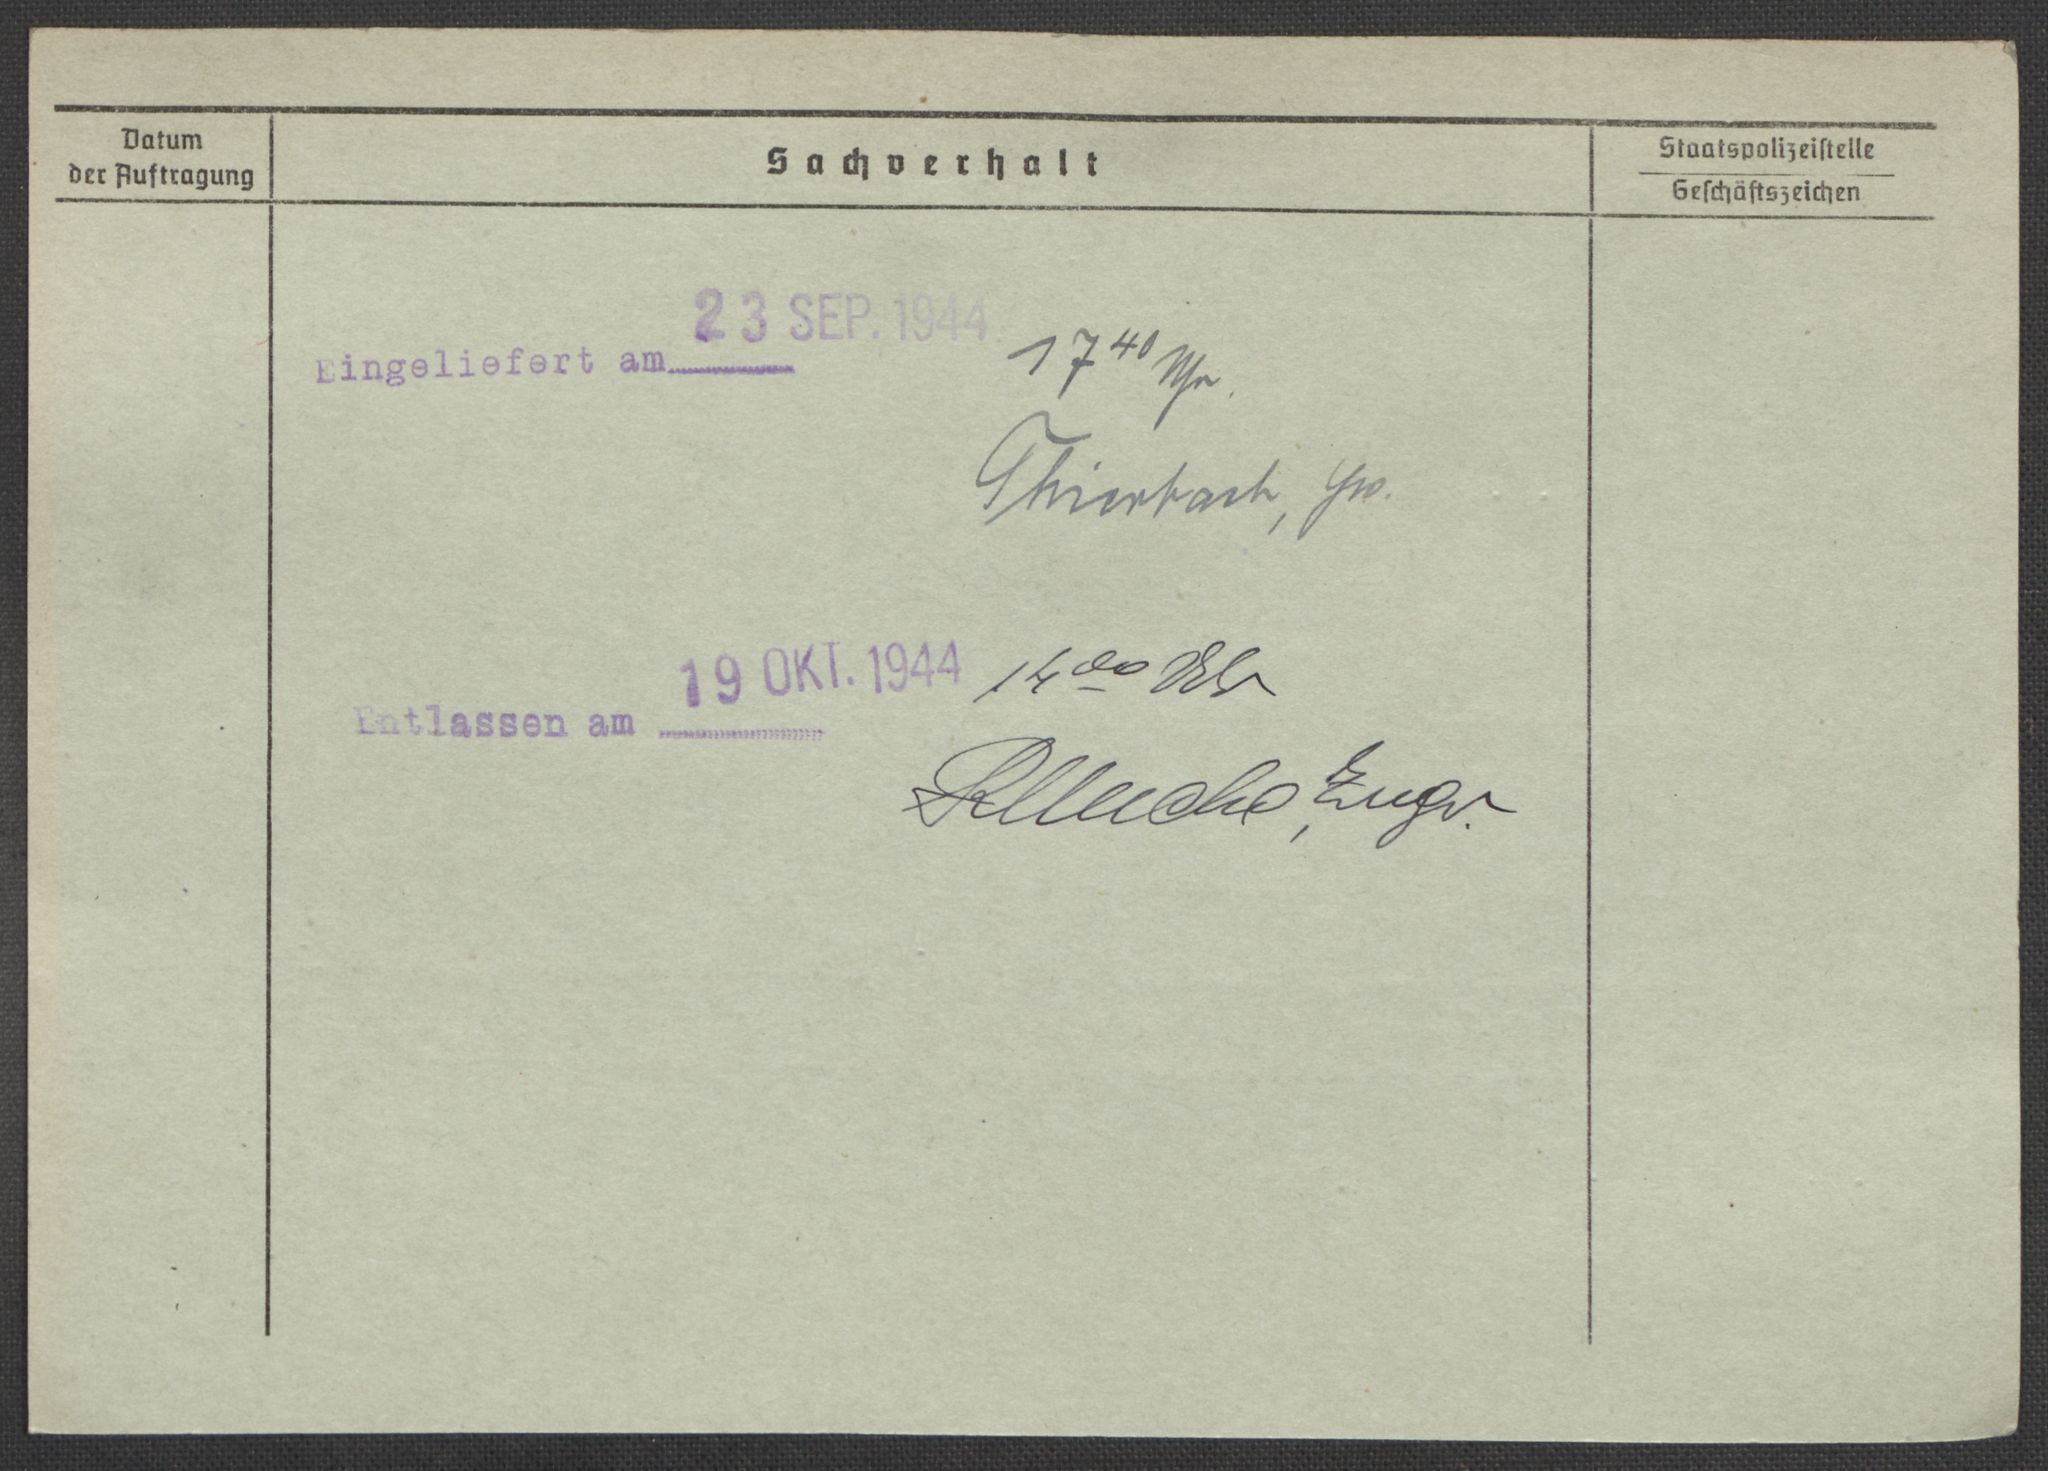 RA, Befehlshaber der Sicherheitspolizei und des SD, E/Ea/Eaa/L0007: Register over norske fanger i Møllergata 19: Lundb-N, 1940-1945, s. 845